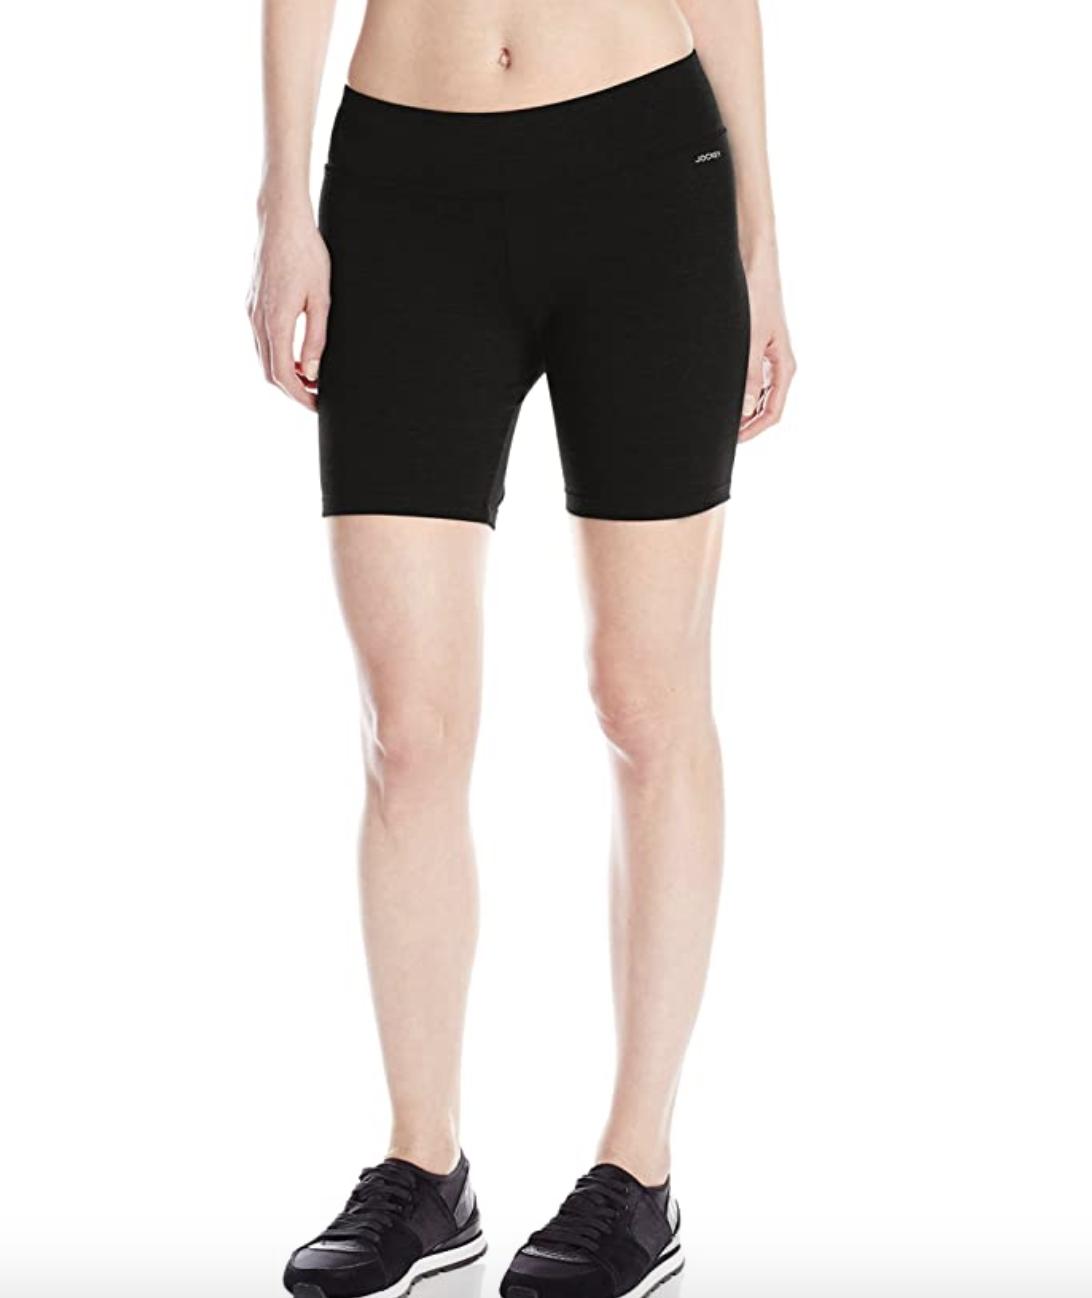 A model in black bike shorts that fall mid thigh